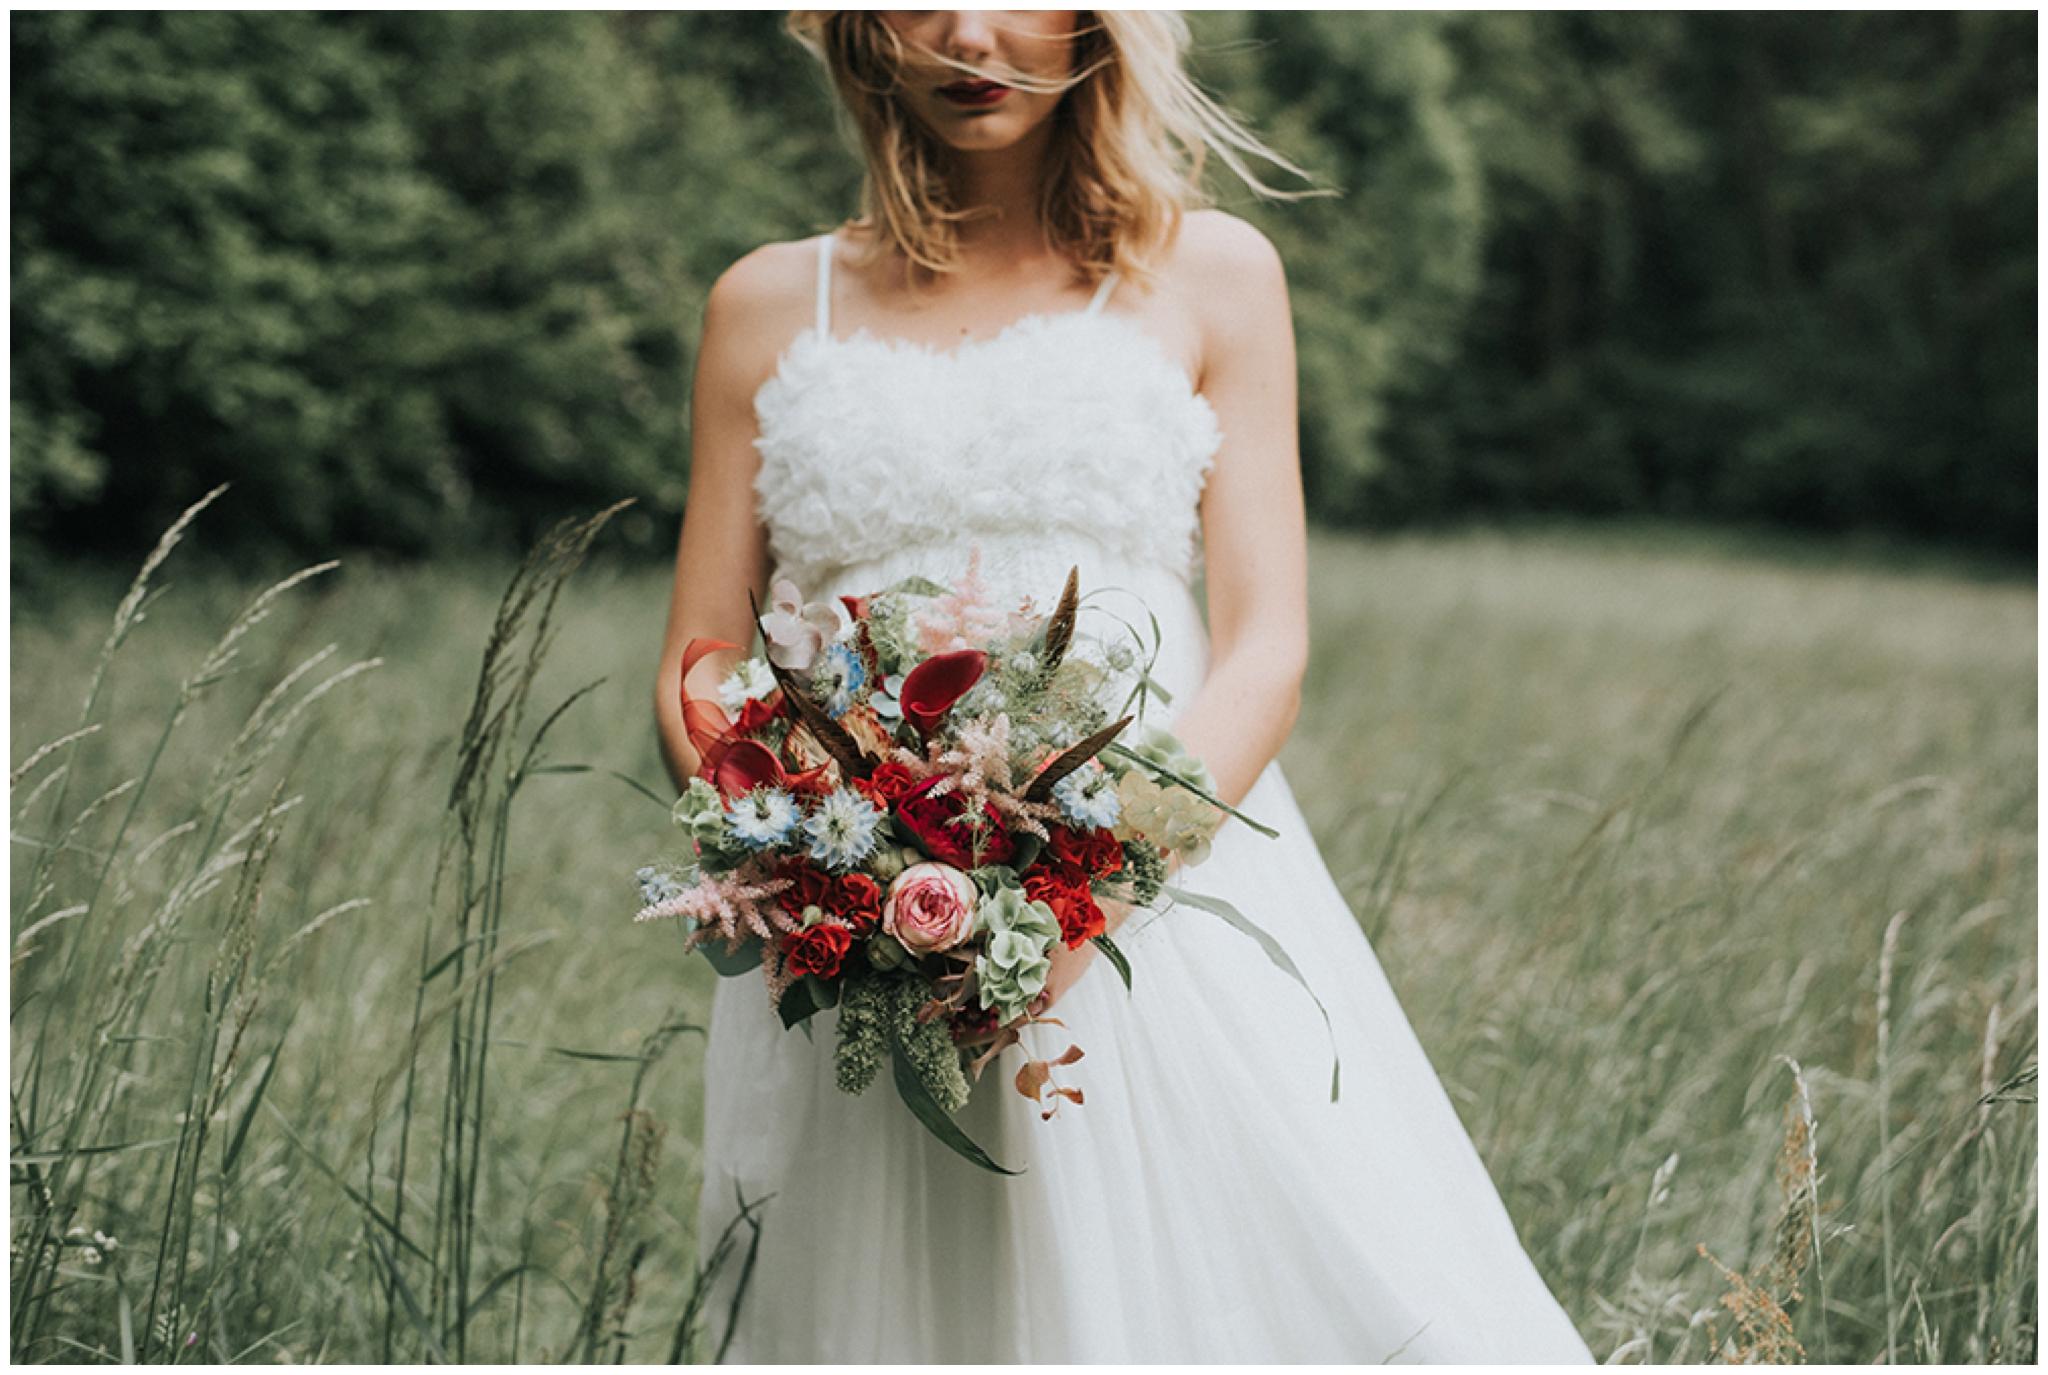 photographe-mariage-grenoble-annecy-lyon-shooting-inspiration-boheme-046